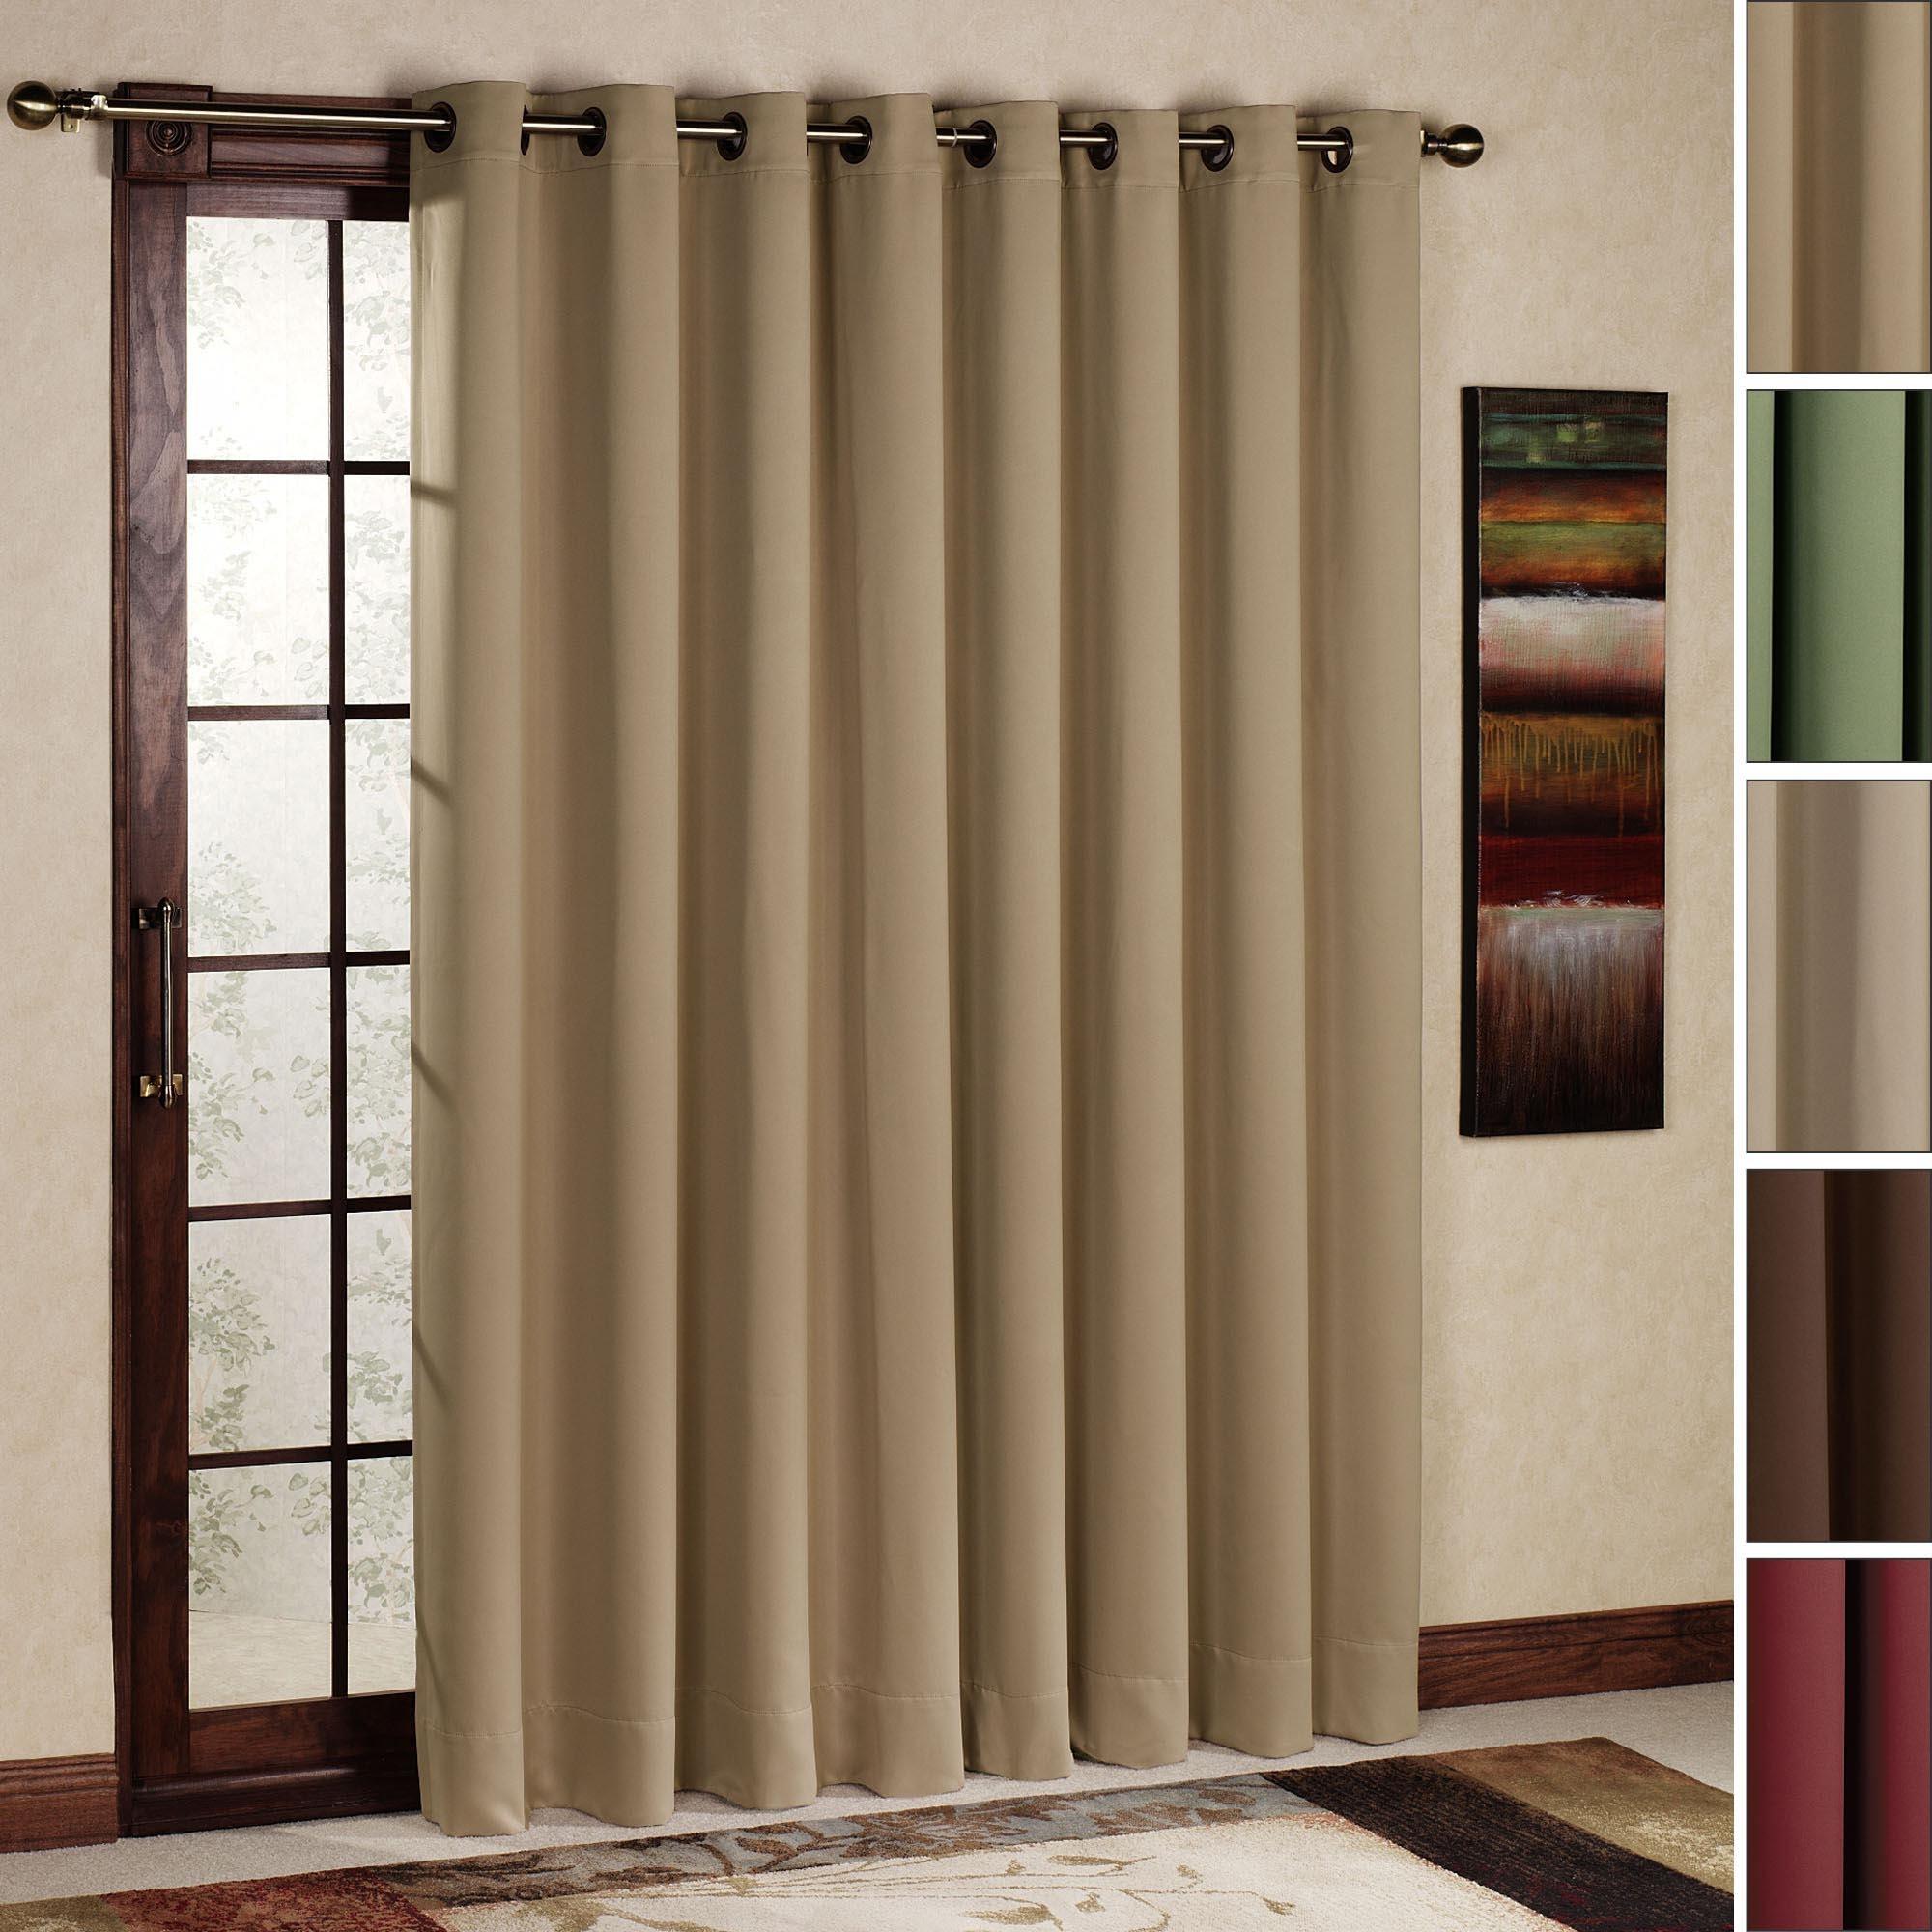 Triple Sliding Glass Door Curtainstriple sliding glass door curtains dors and windows decoration